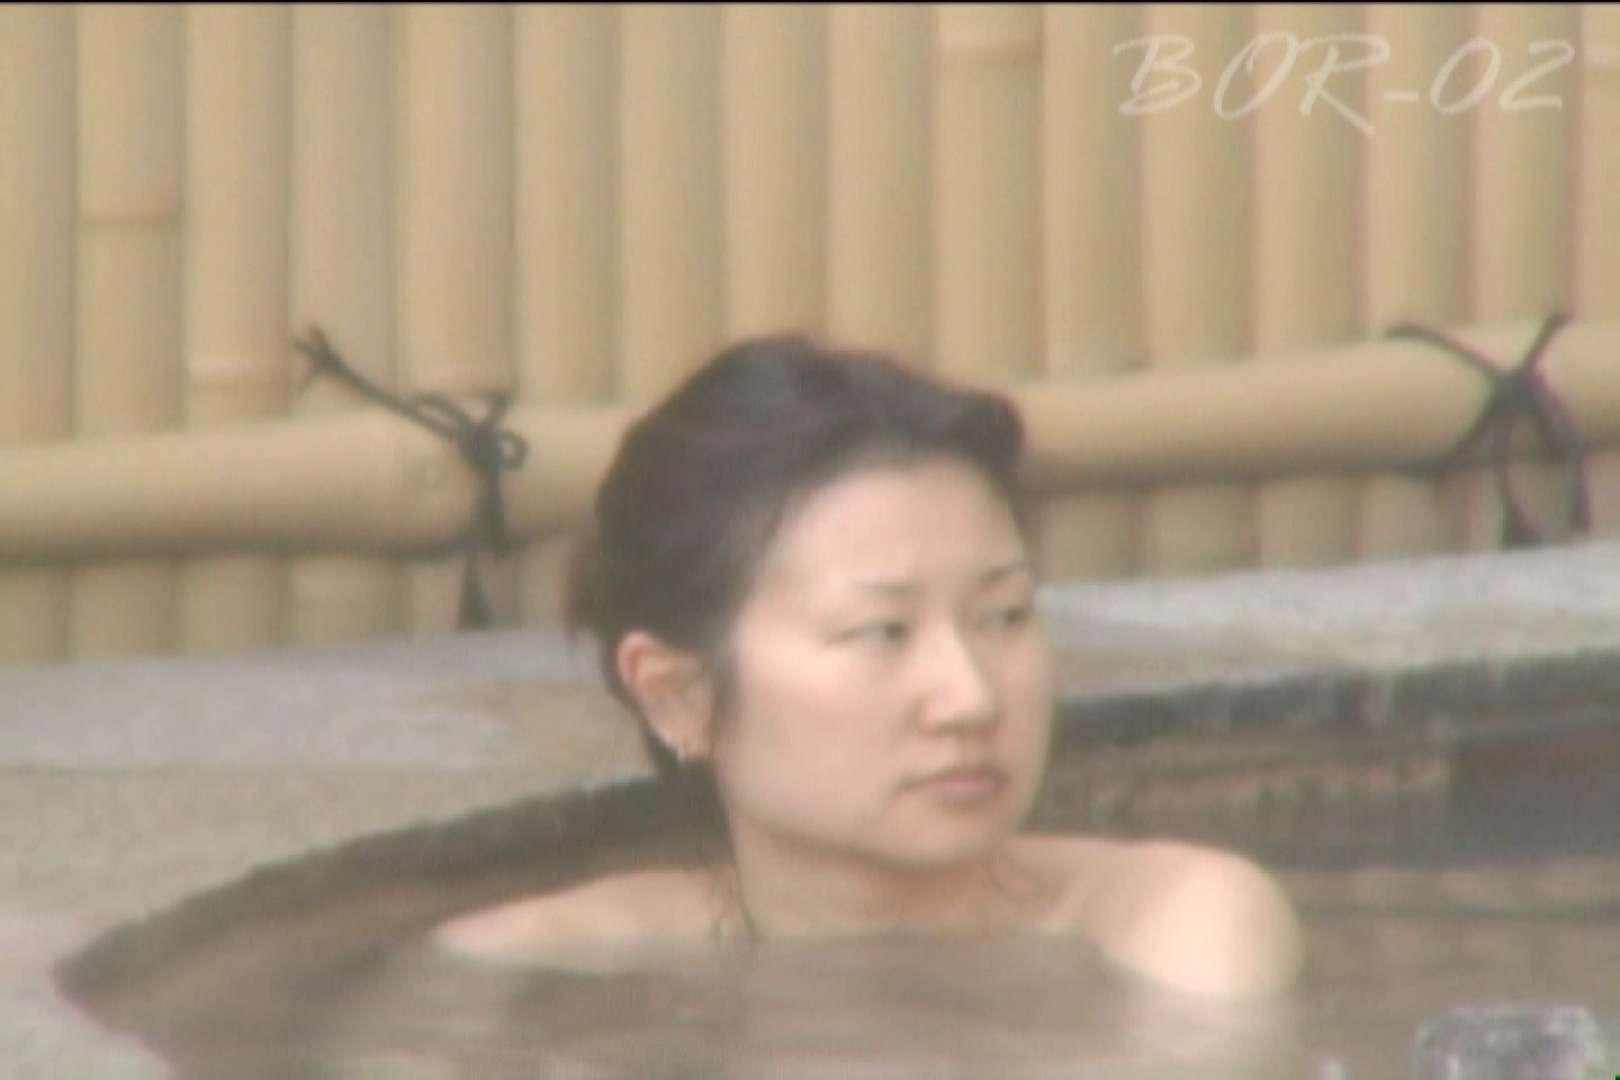 Aquaな露天風呂Vol.477 0  28連発 2